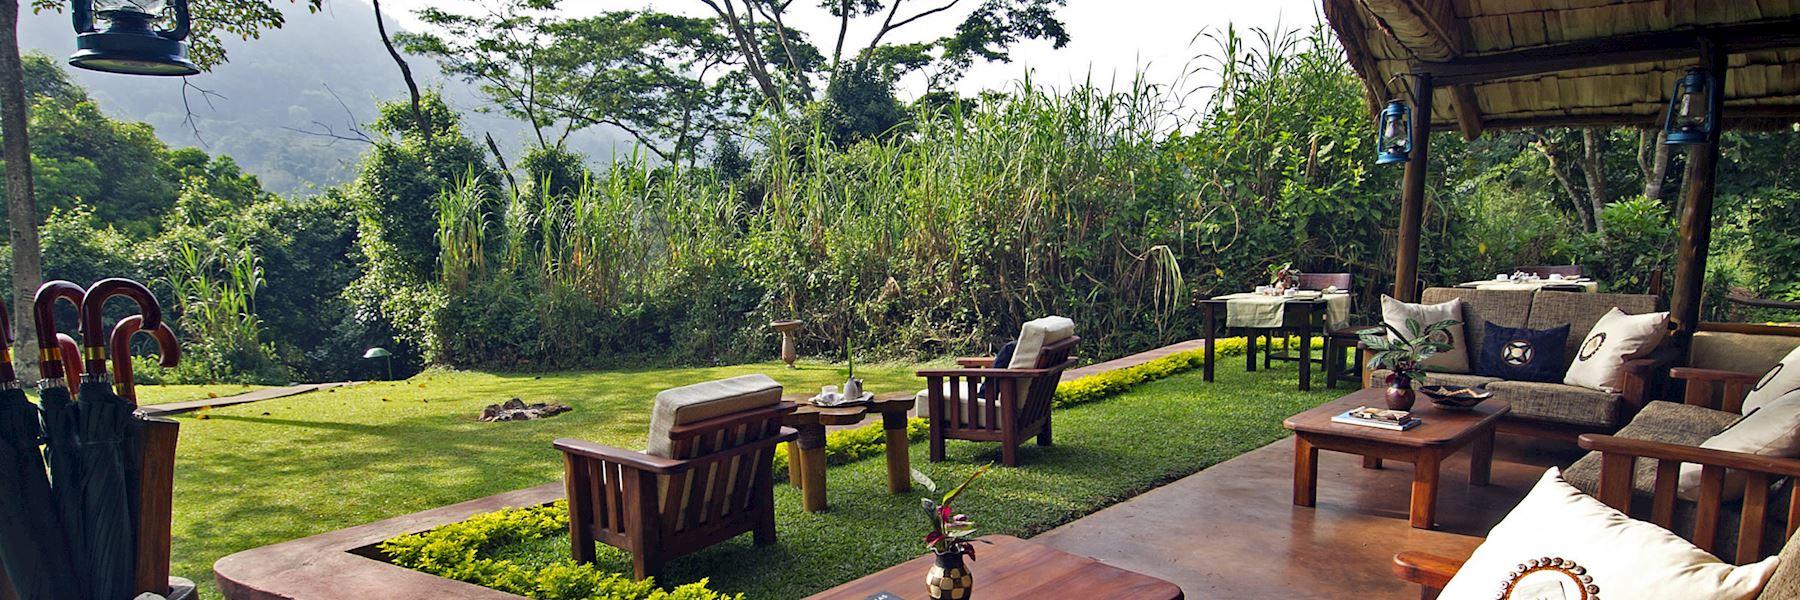 Accommodation in Uganda